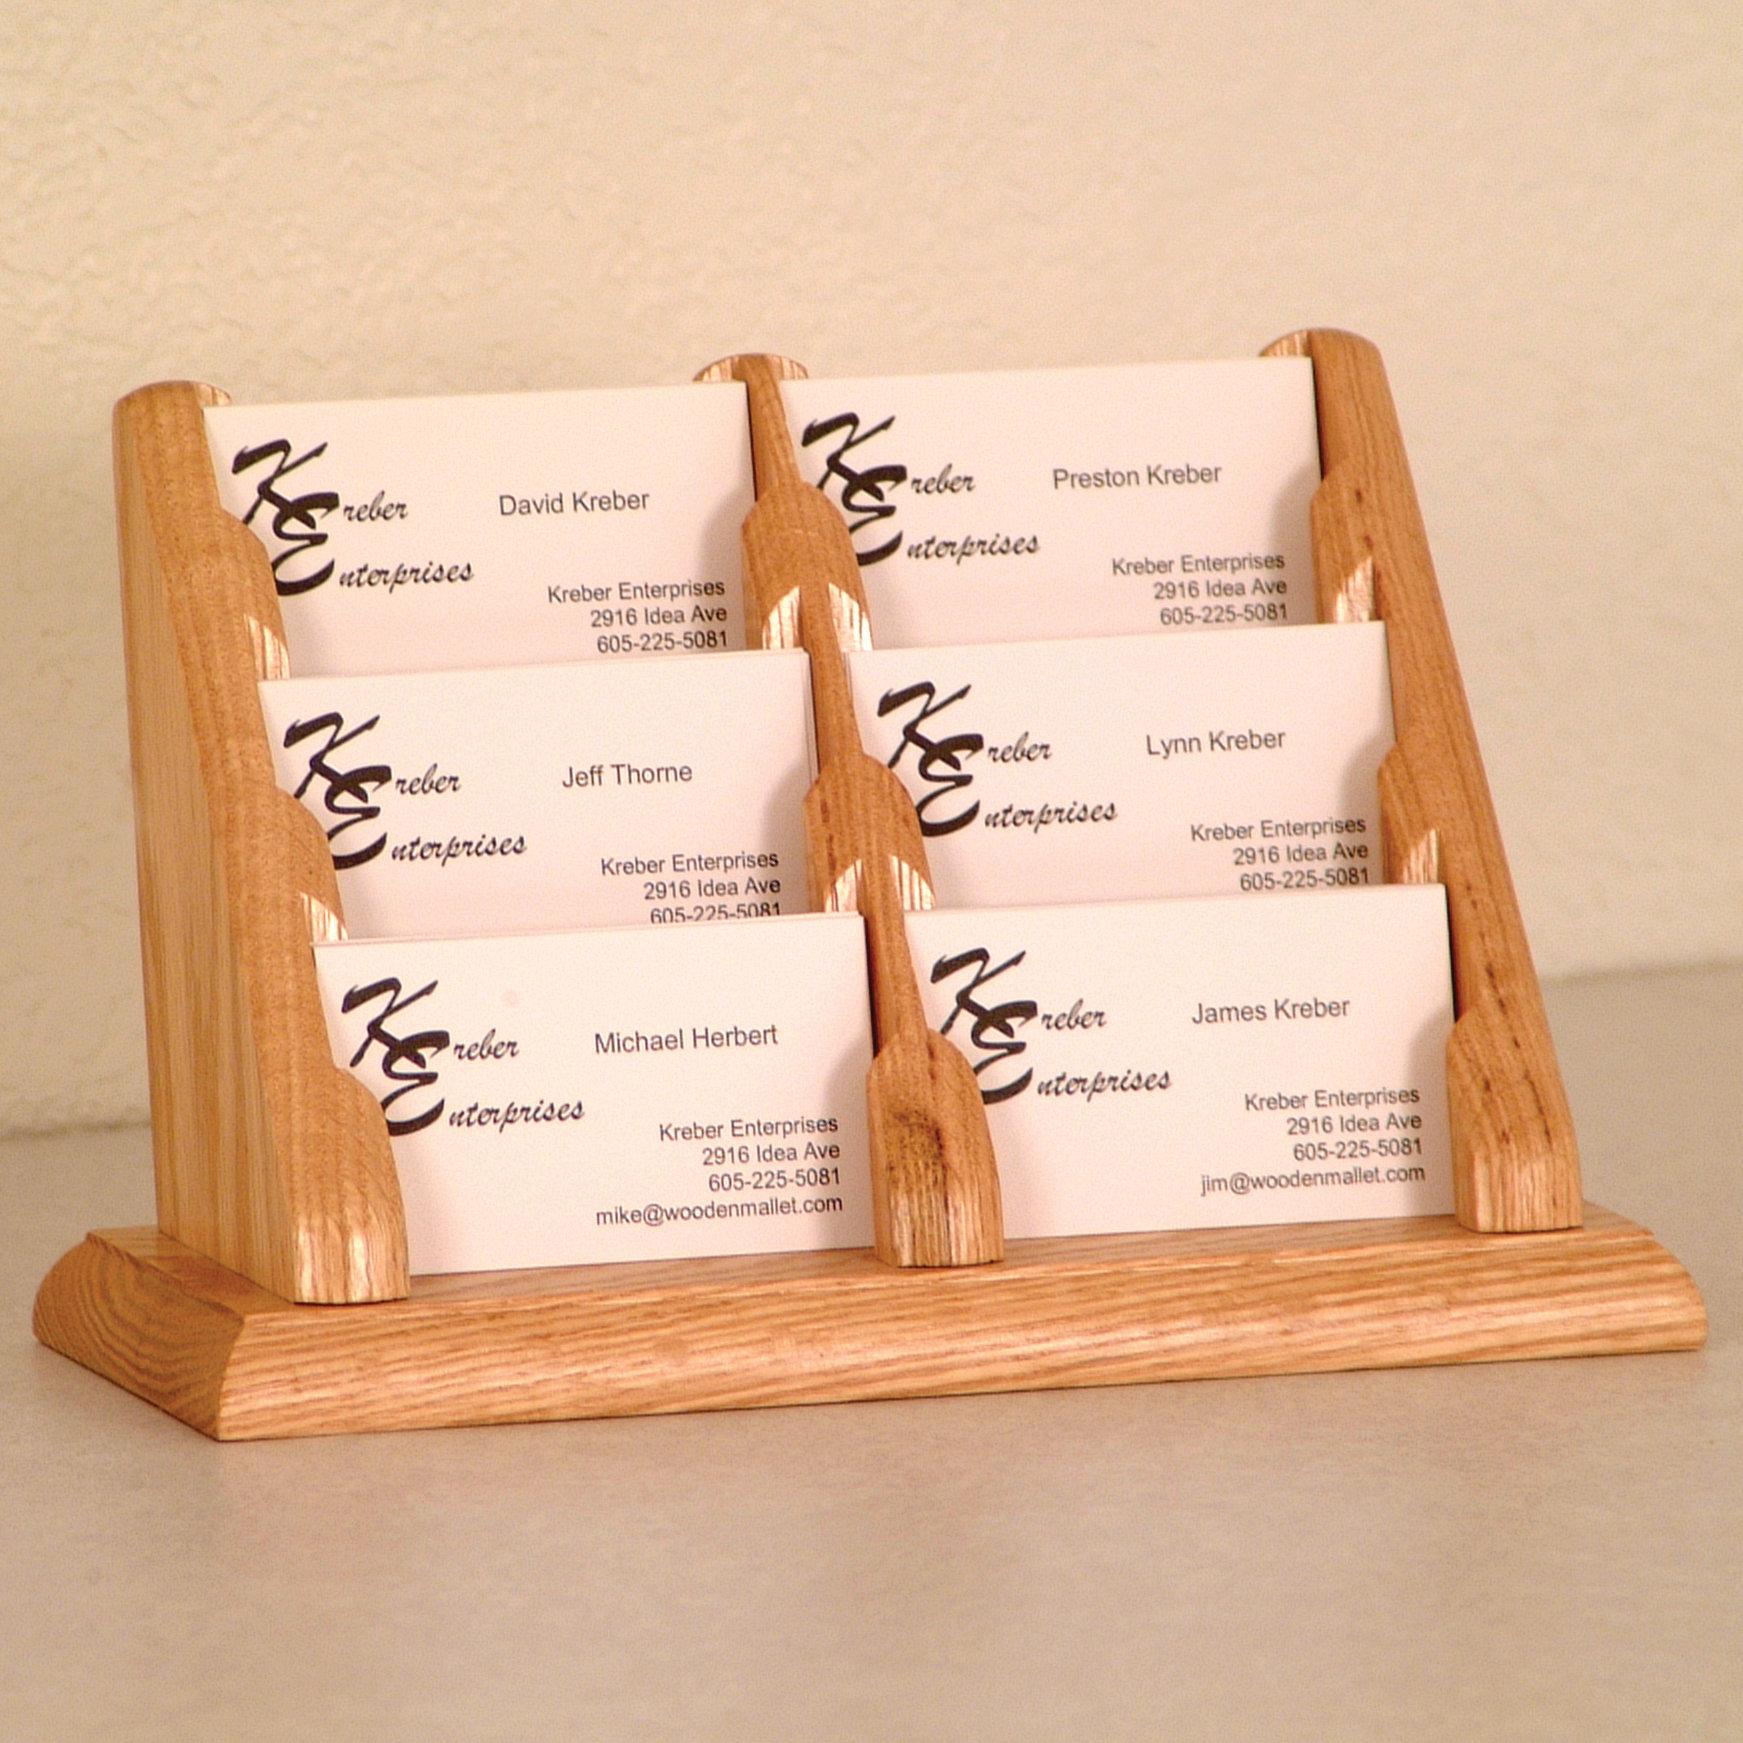 6 Pocket Business Card Display